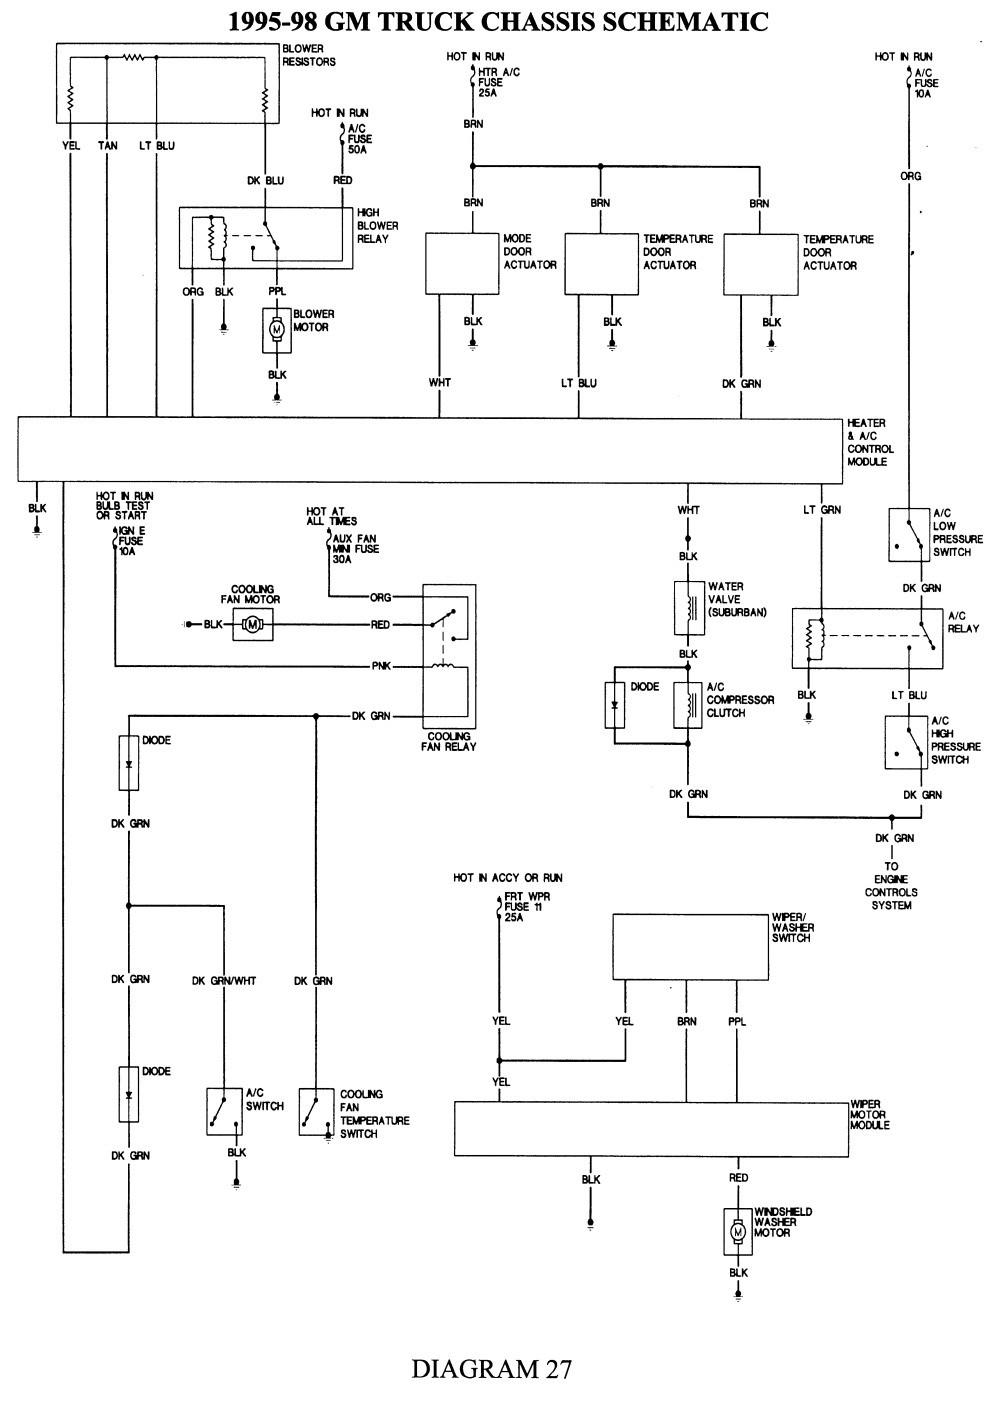 hight resolution of 1976 chevy gmc p10 p20 p30 wiring diagram stepvan motorhome p15